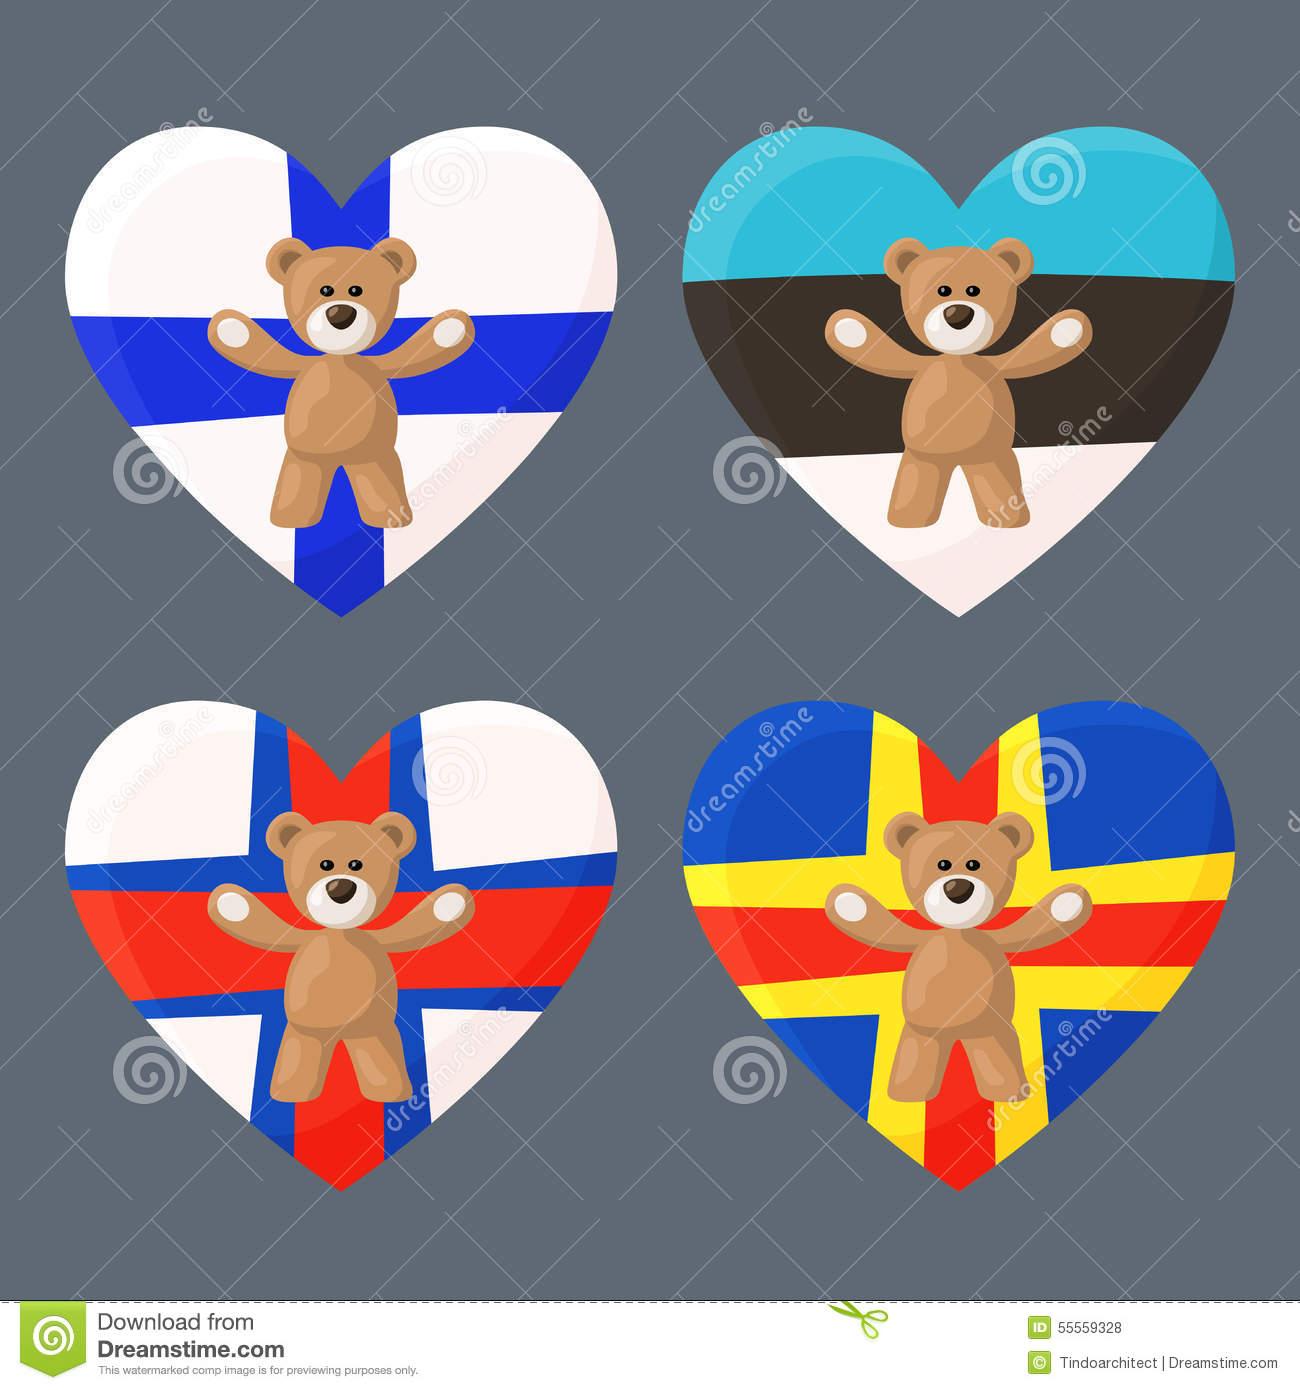 Finnish, Estonian, Faroese And Aland Teddy Bears Stock Vector.